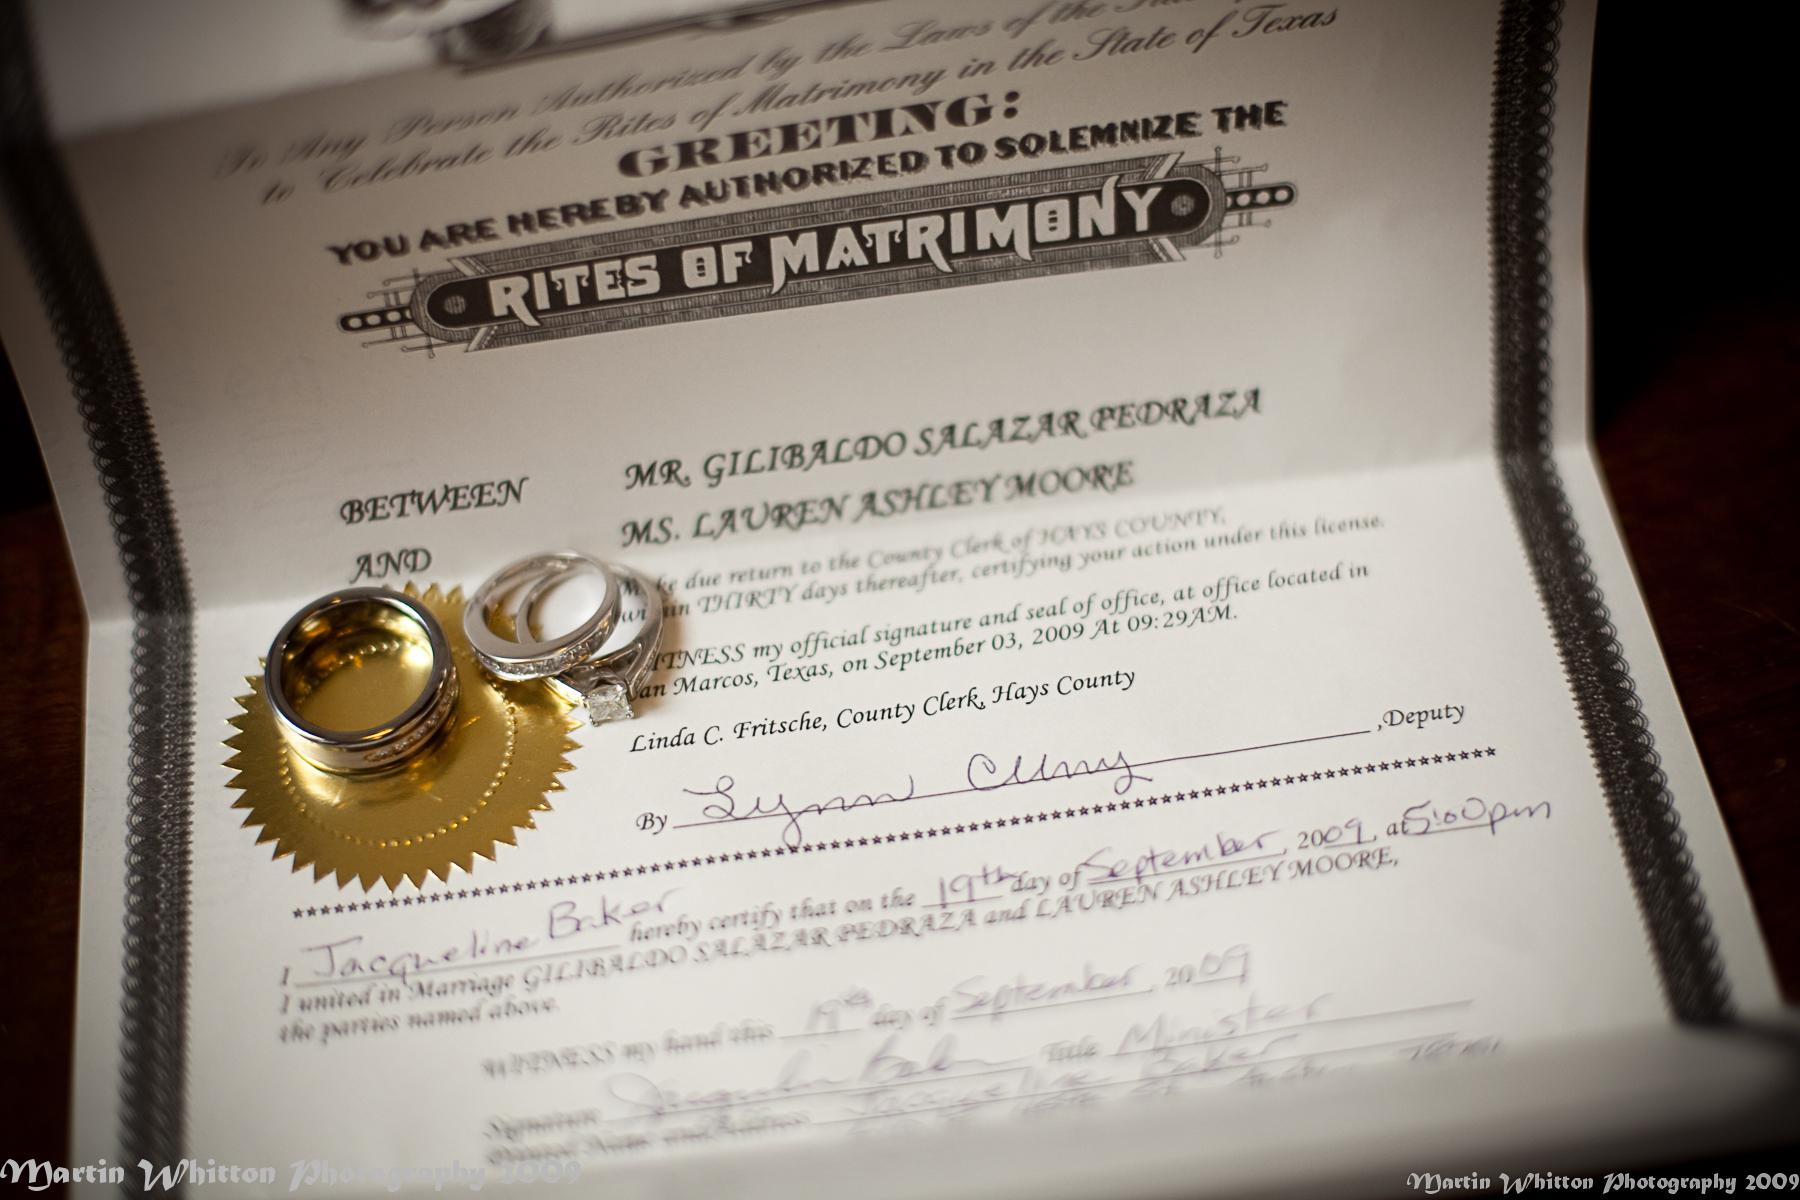 Photo tips austin americana studio austin texas marriage certificate xflitez Image collections